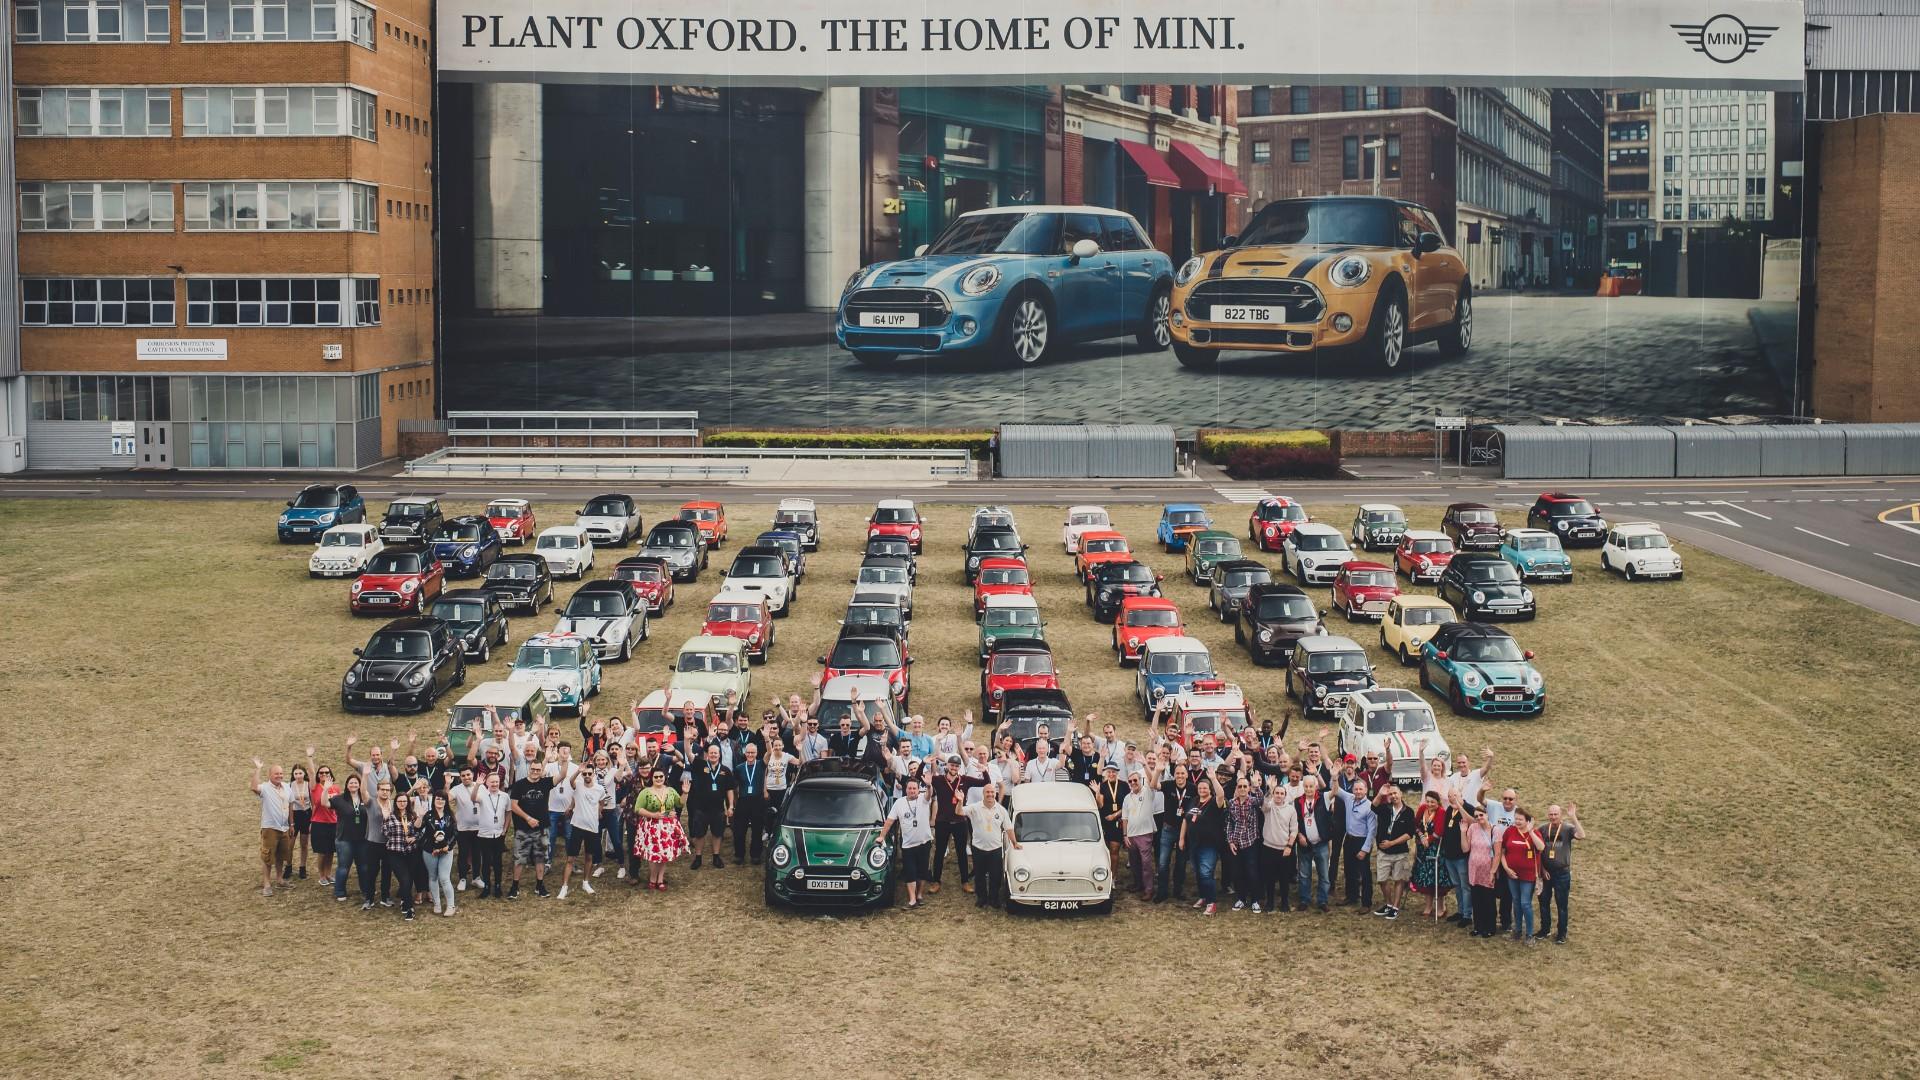 60 Minis gather to celebrate 60 years